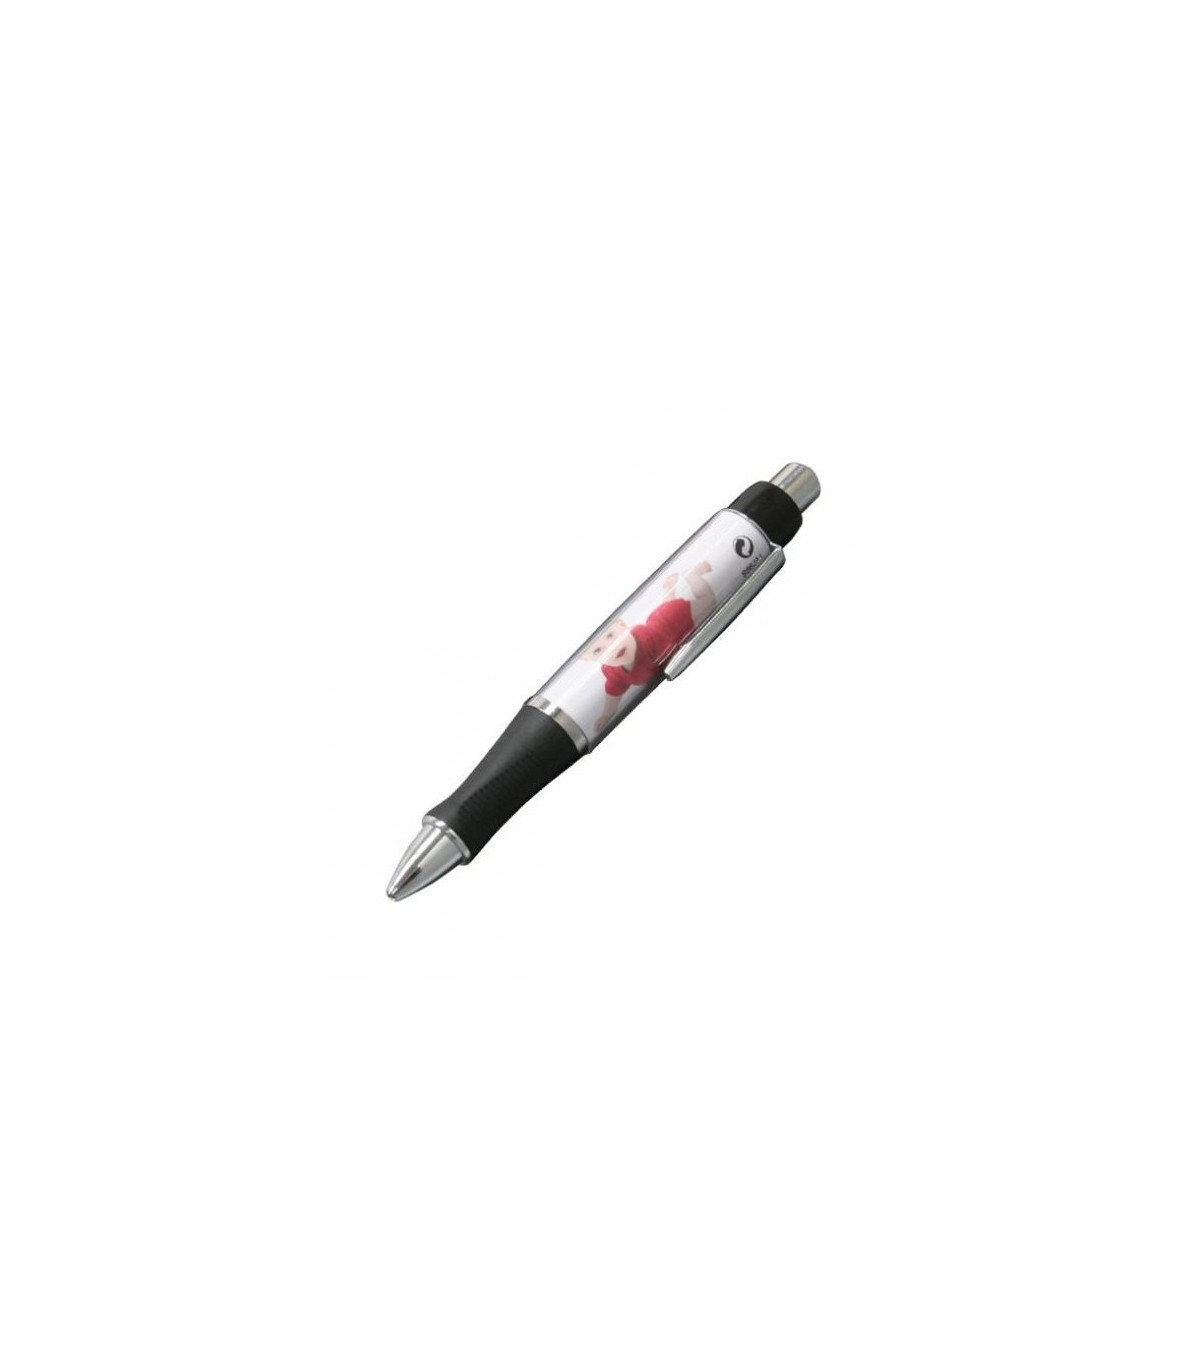 stylo photo personnalise